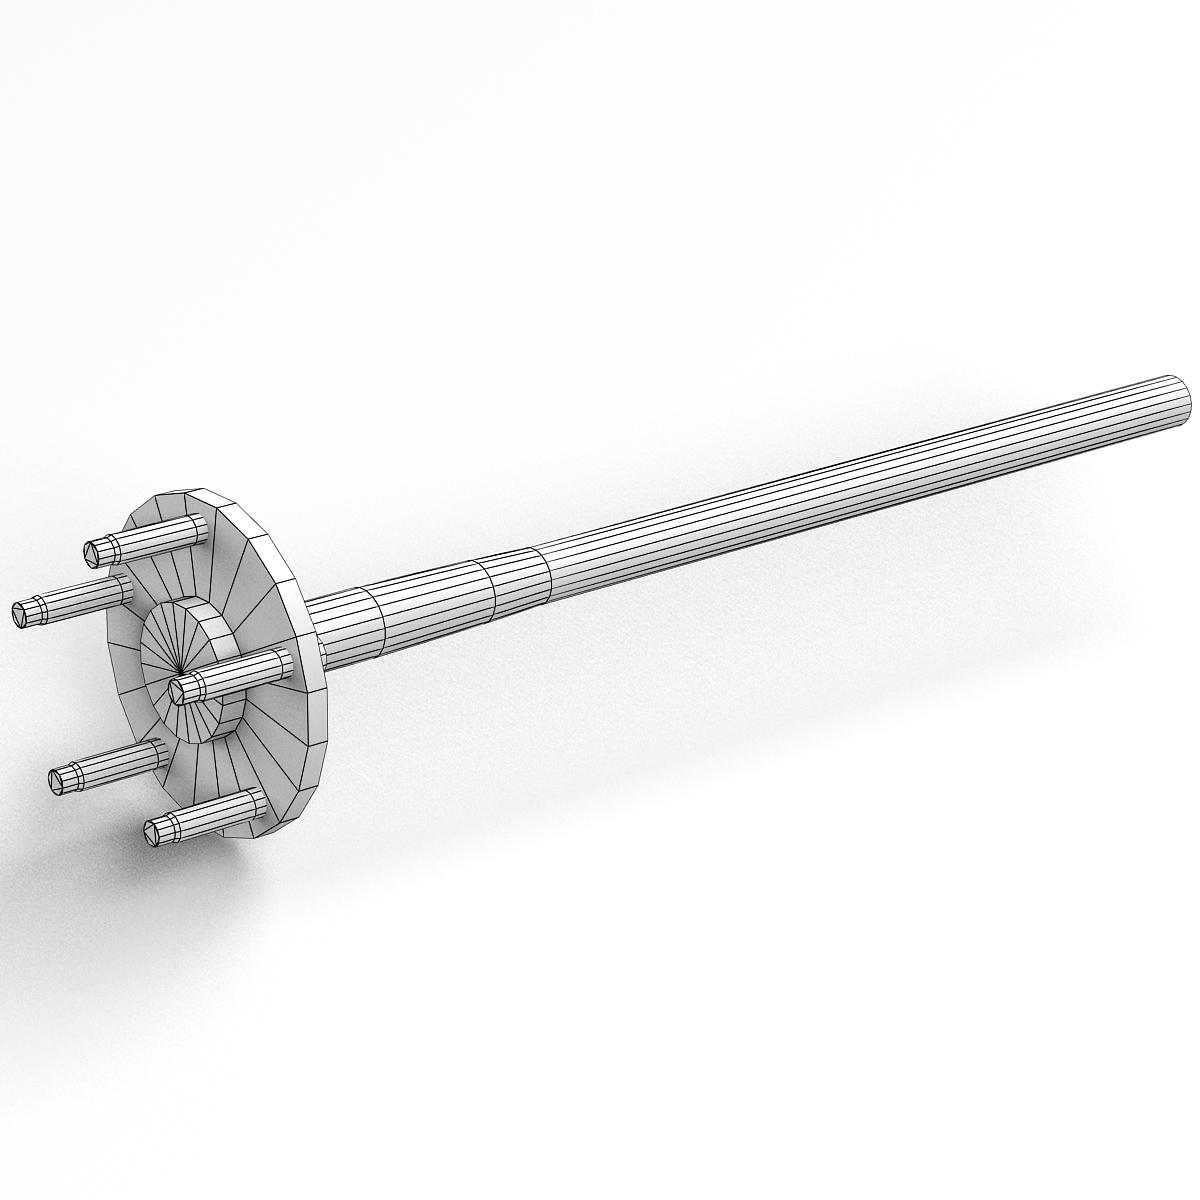 Axle and driveshaft 3d model 3ds max fbx tga targa icb vda vst pix obj 224444